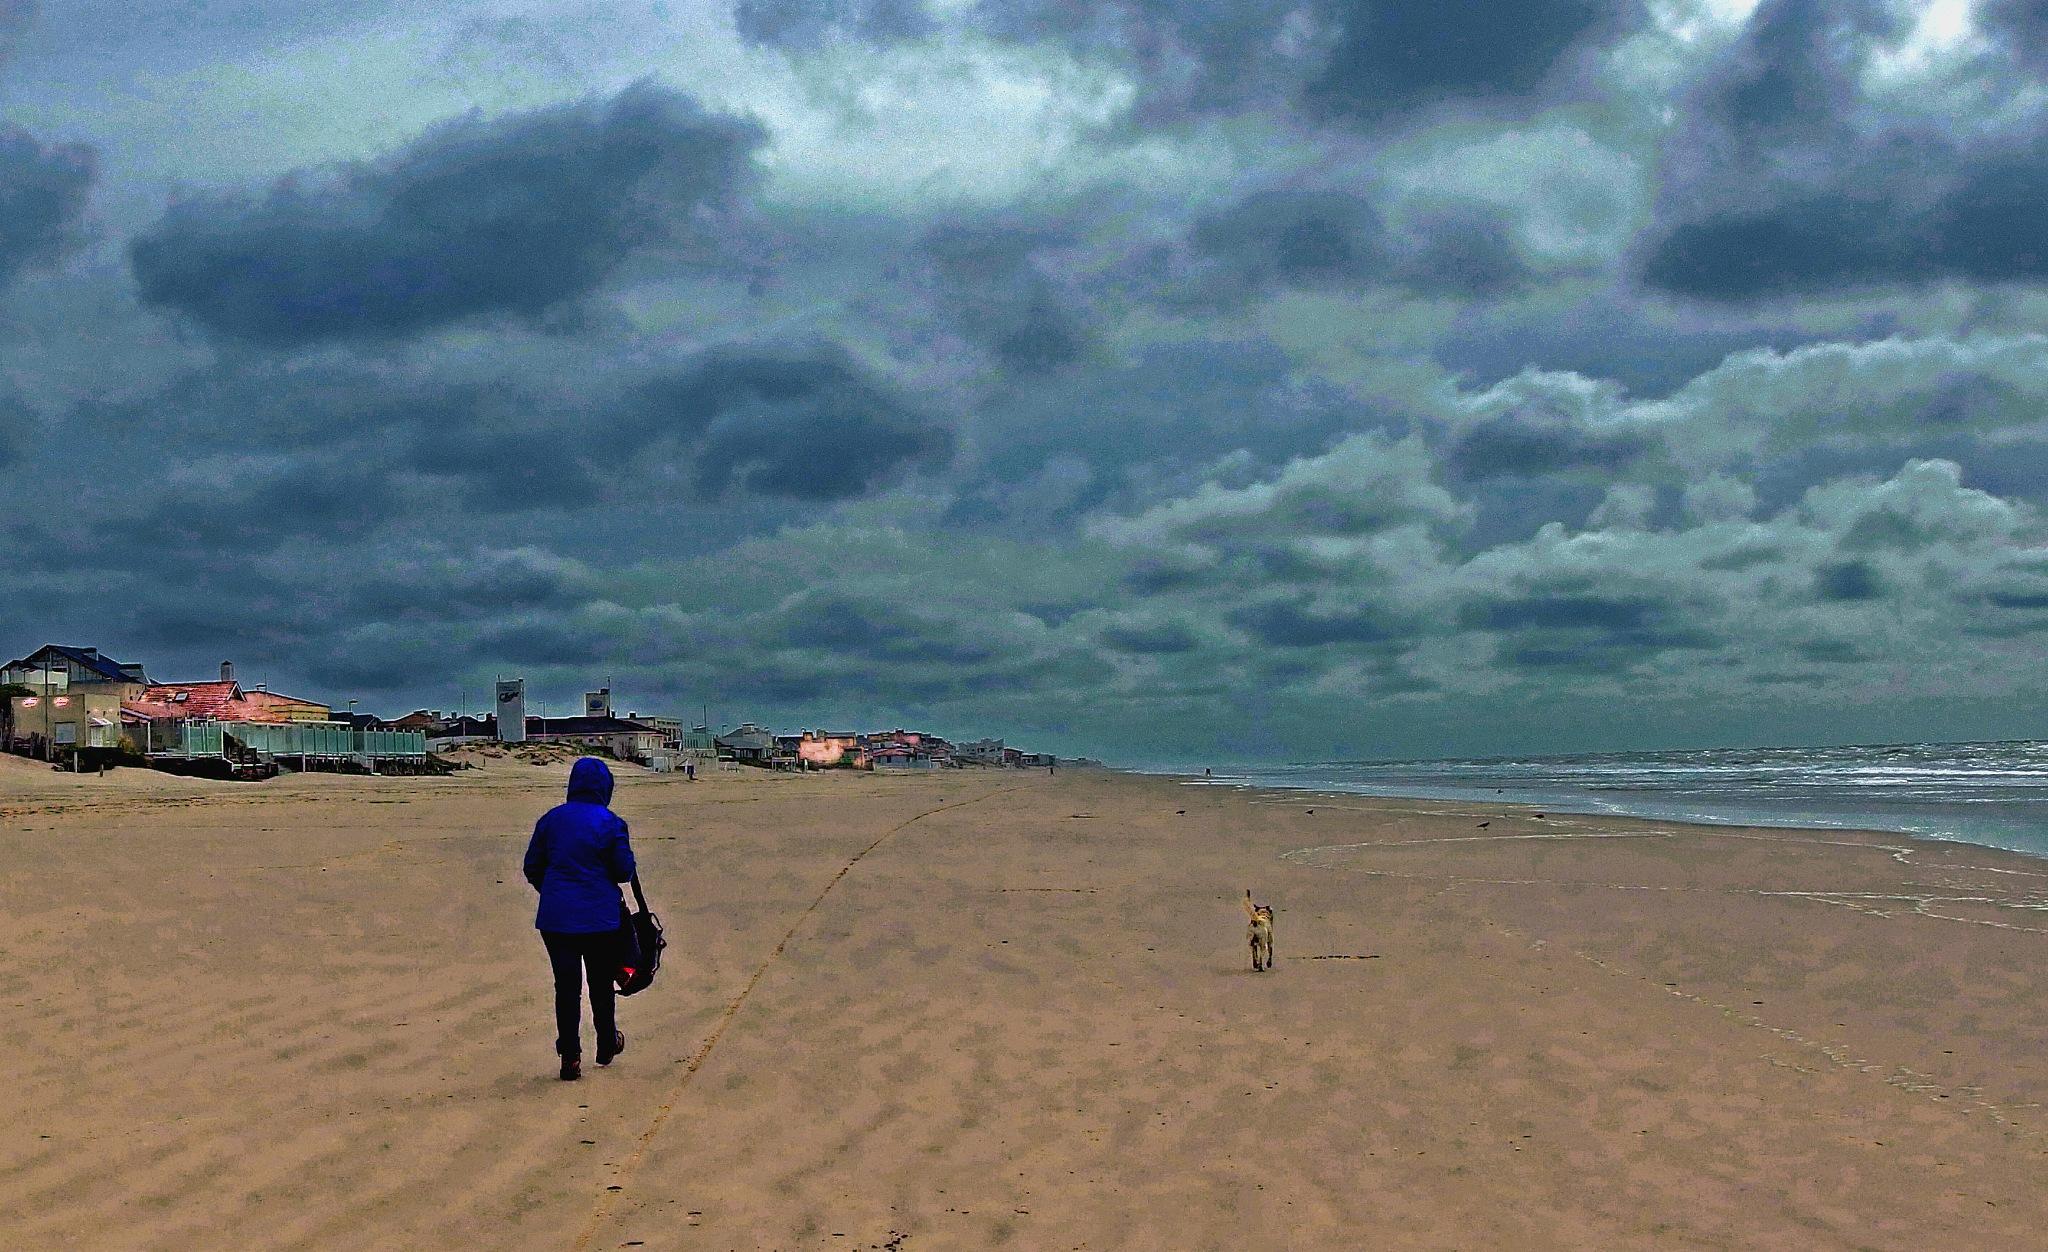 Stormy weather by Alberto Figueroa